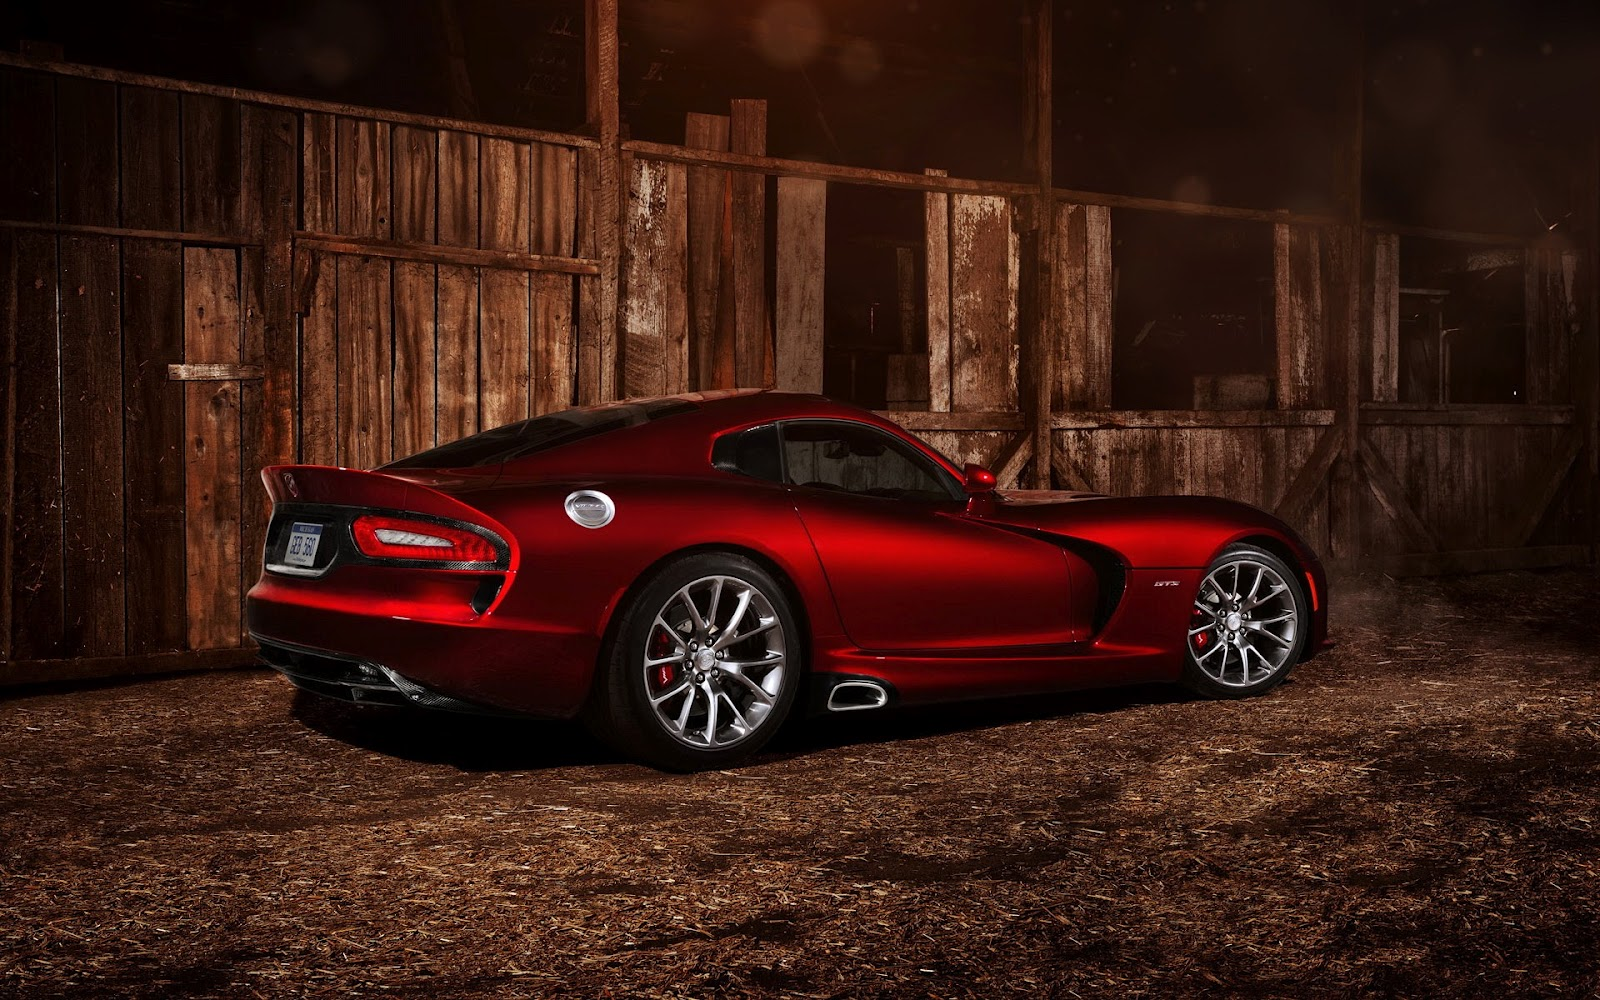 Red dodge srt viper gts 2013 hd car wallpapers